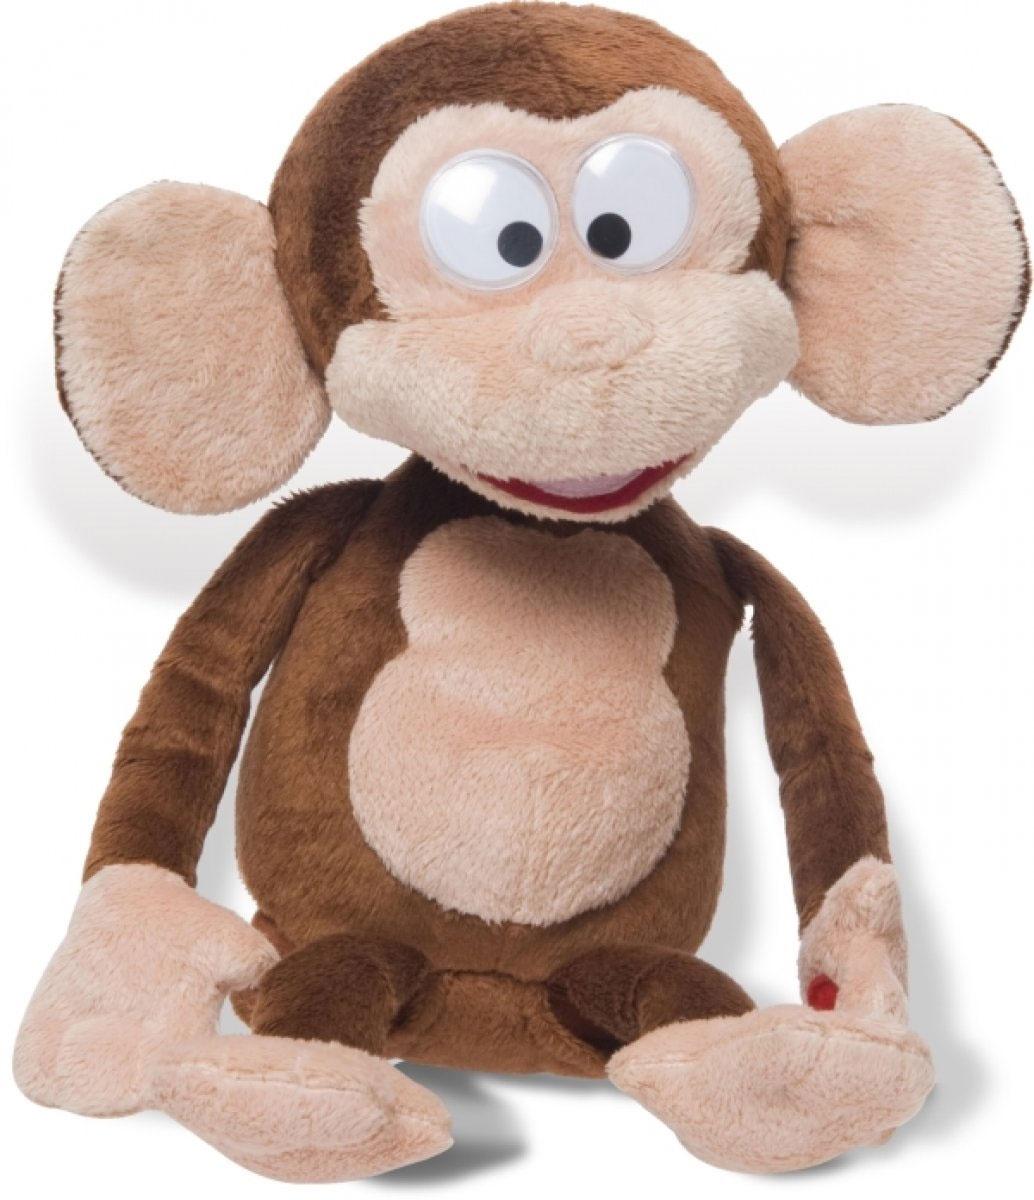 Verrückter Affe Plüschaffe 35 cm von IMC